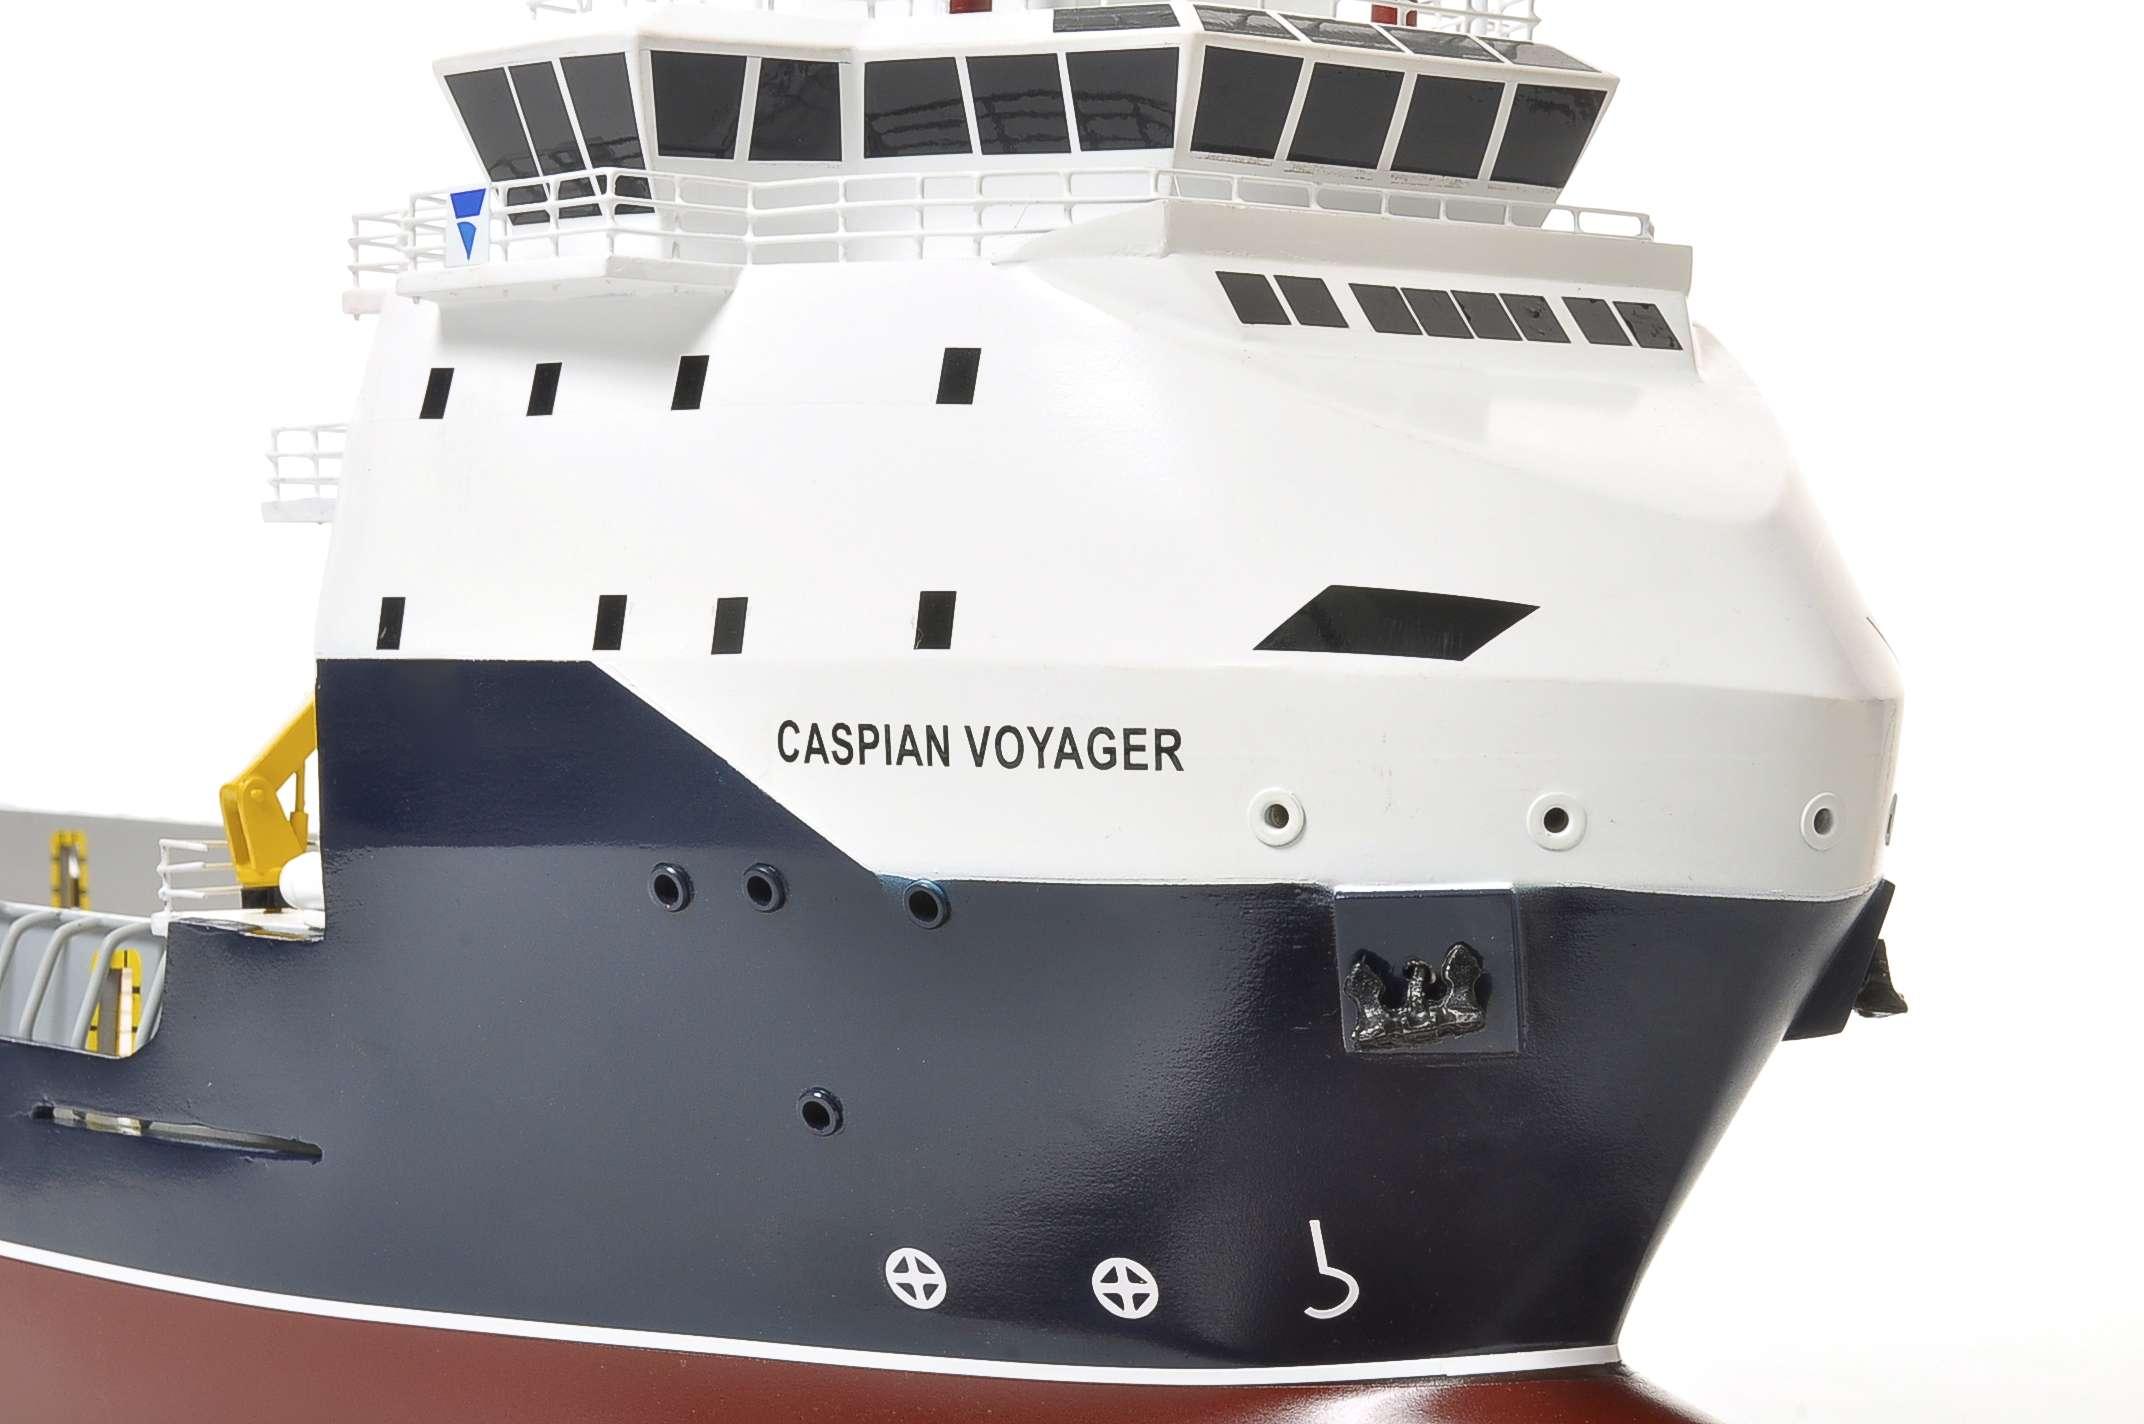 1476-4330-Caspian-Voyager